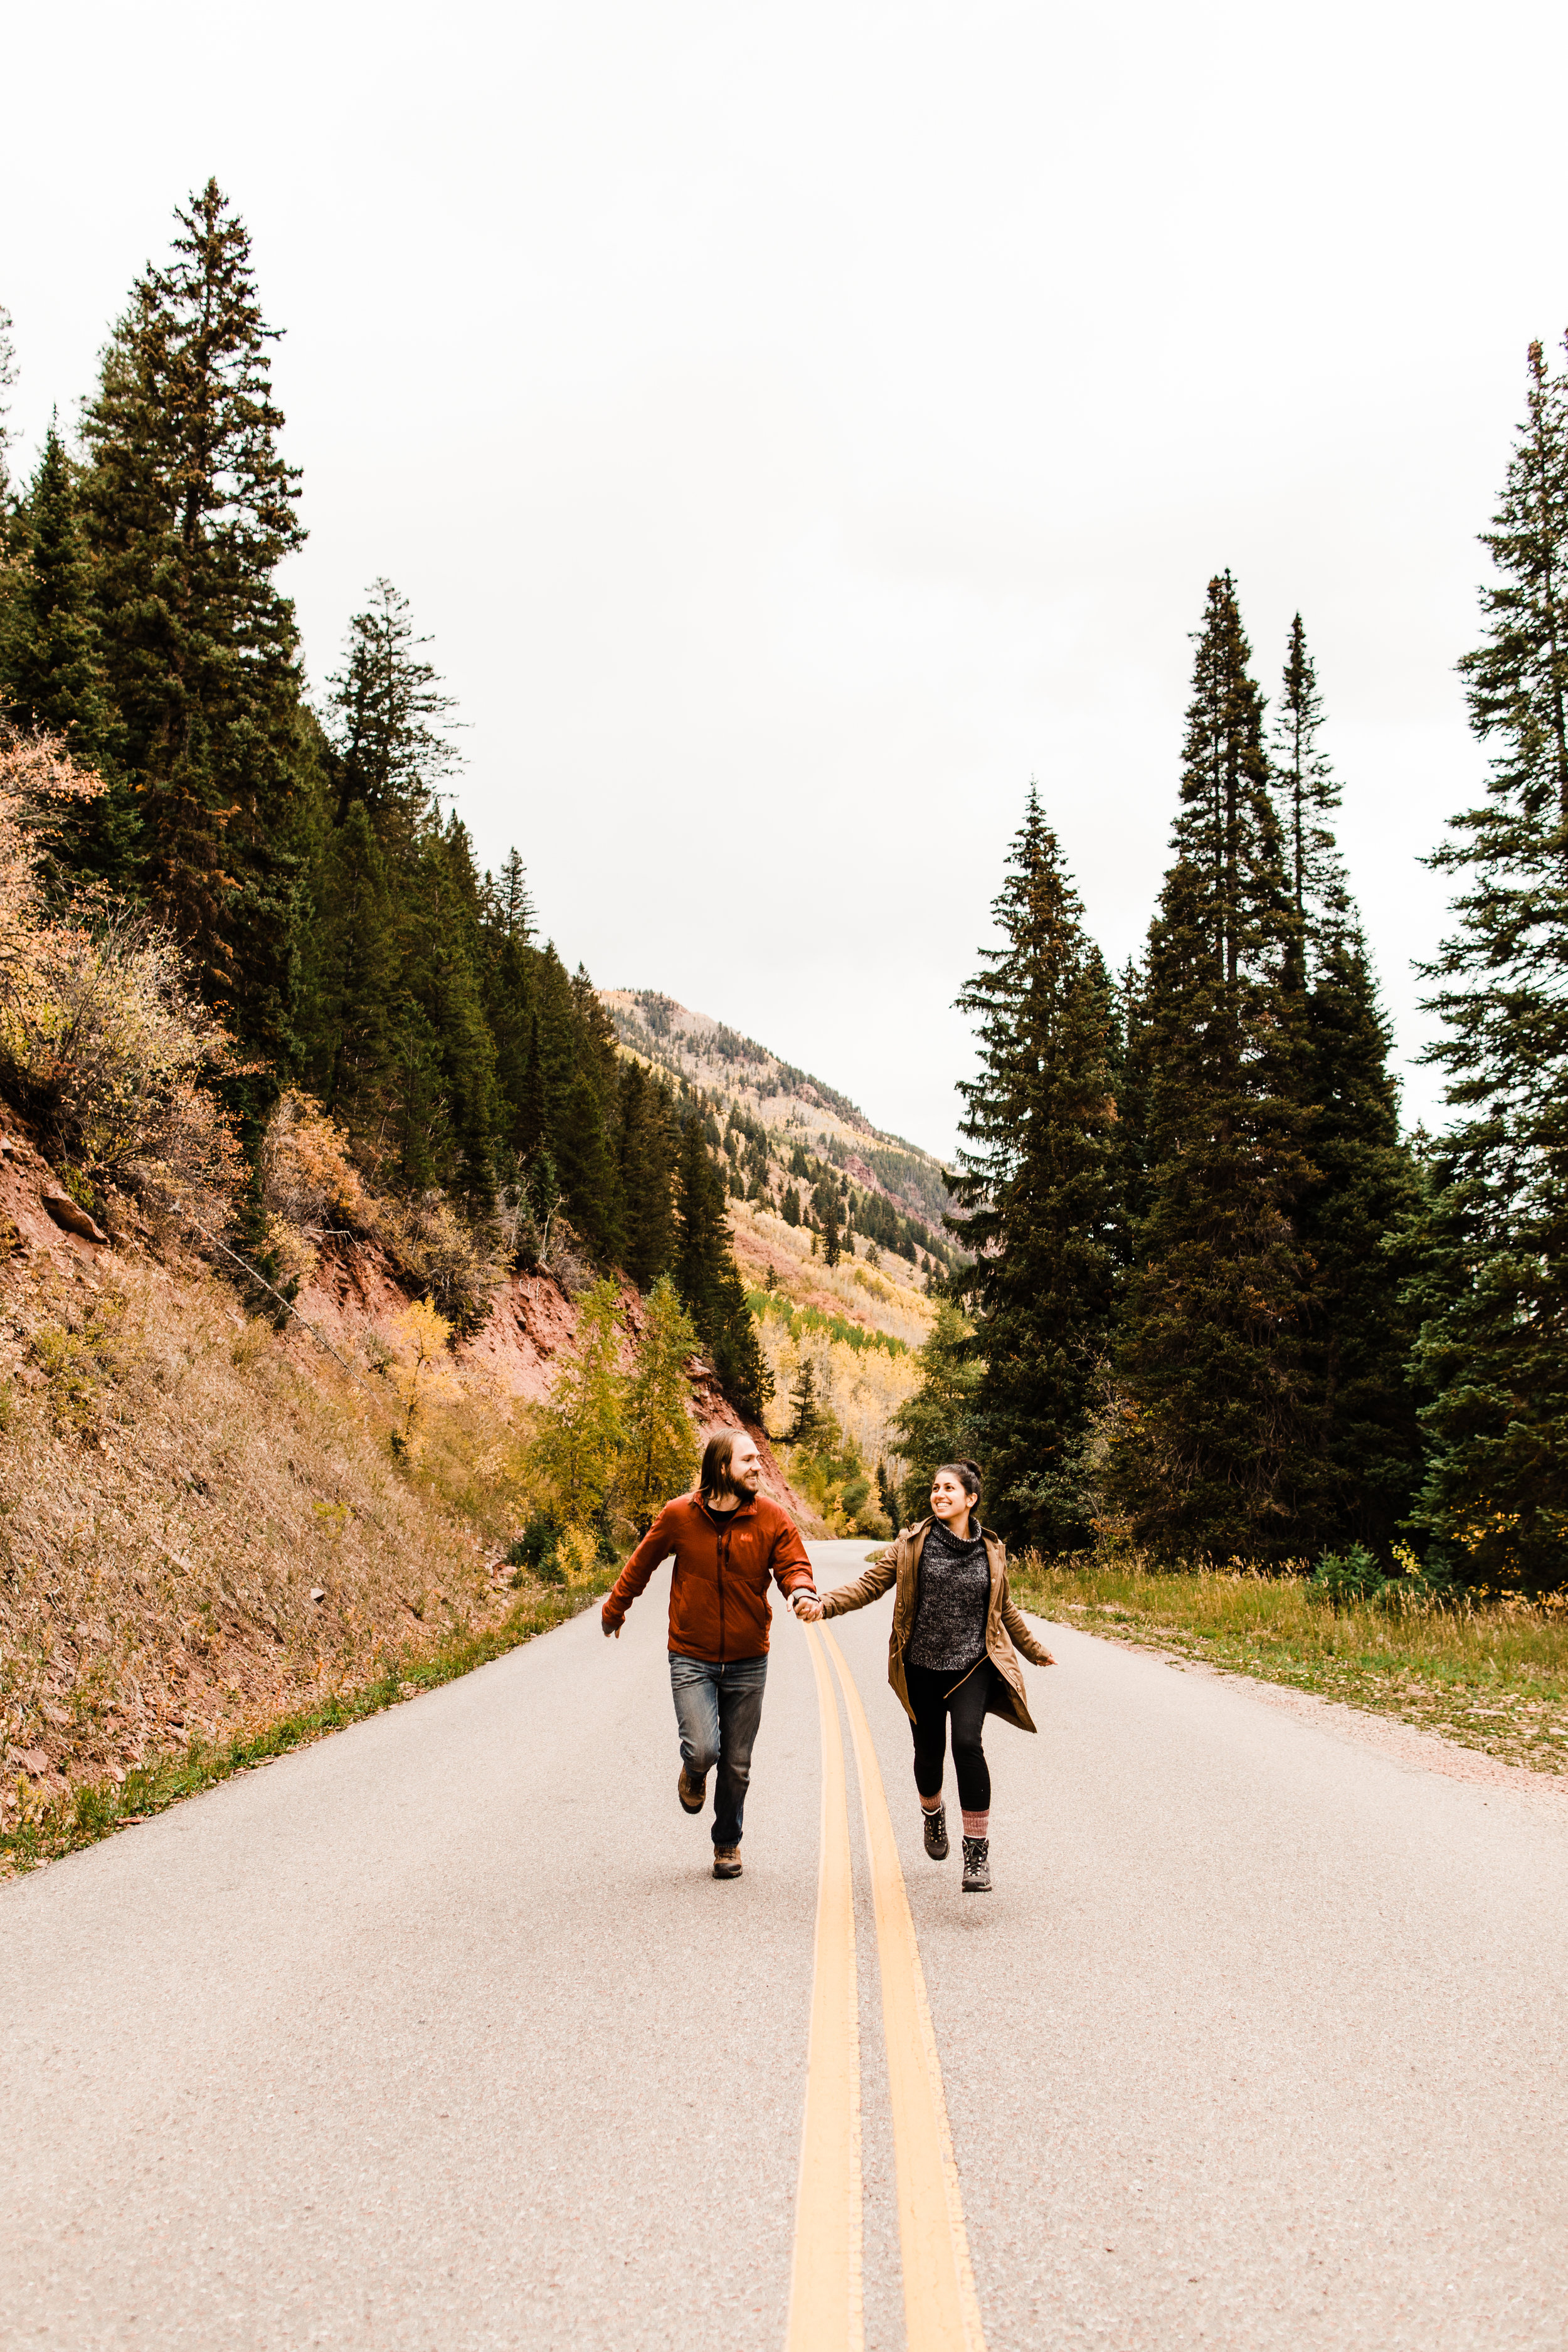 Copy of Aspen Colorado engagement session at Maroon Bells | Best Aspen elopement photographers